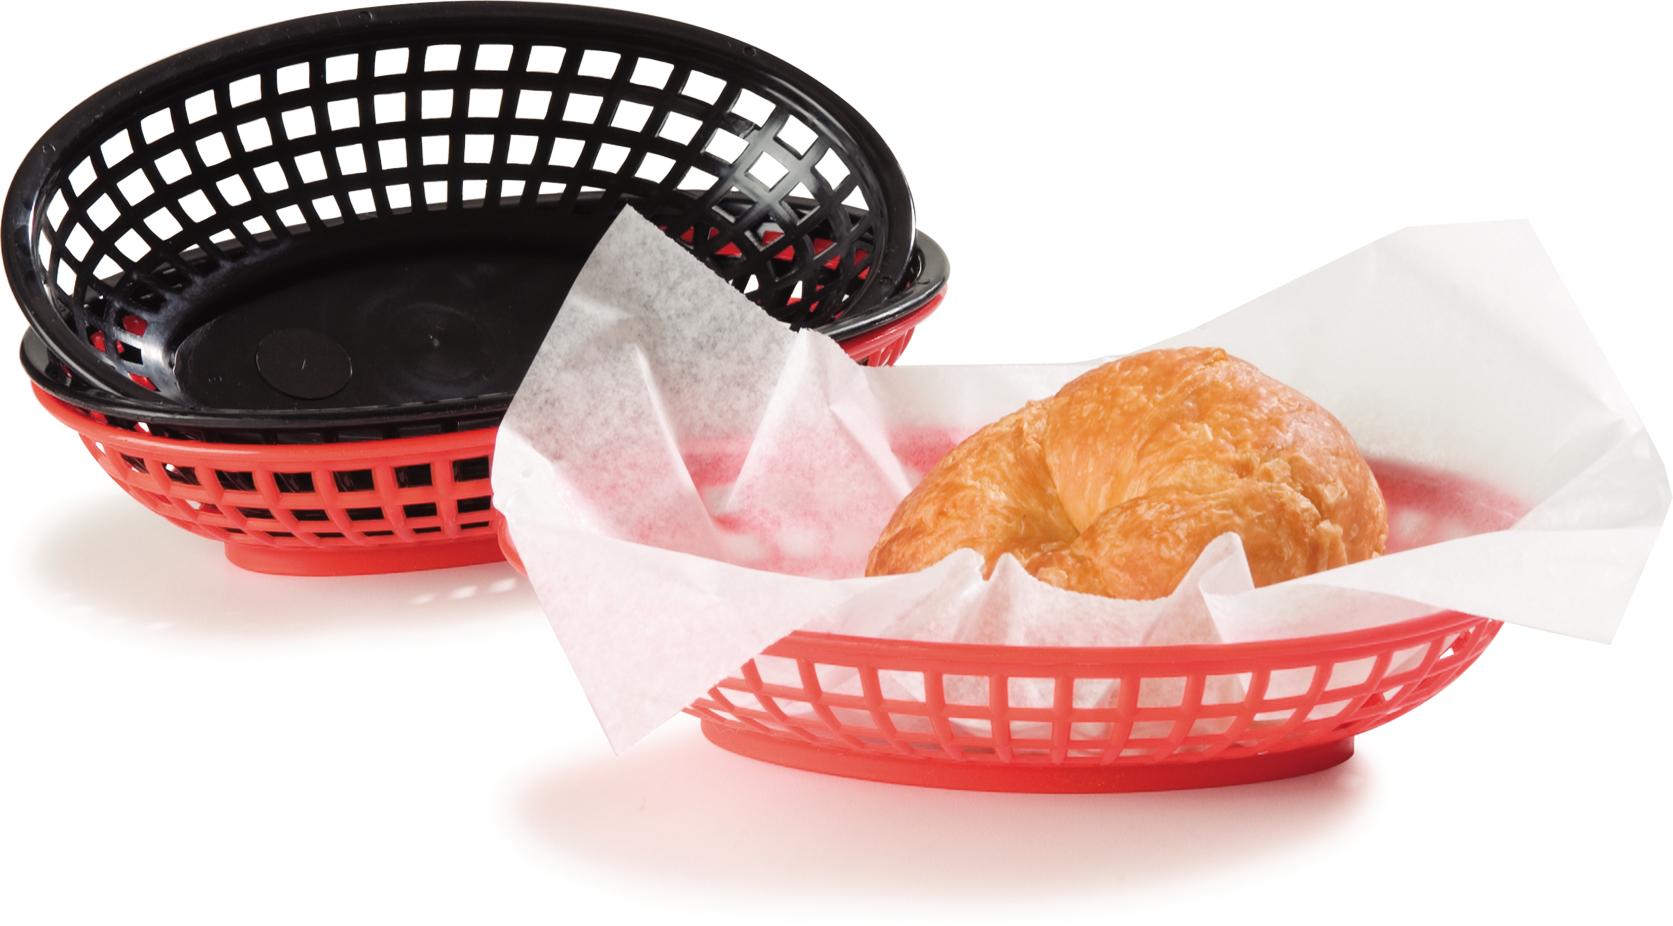 Bread And Bun Basket Oval Basket 9-1/4 x 6 - Black